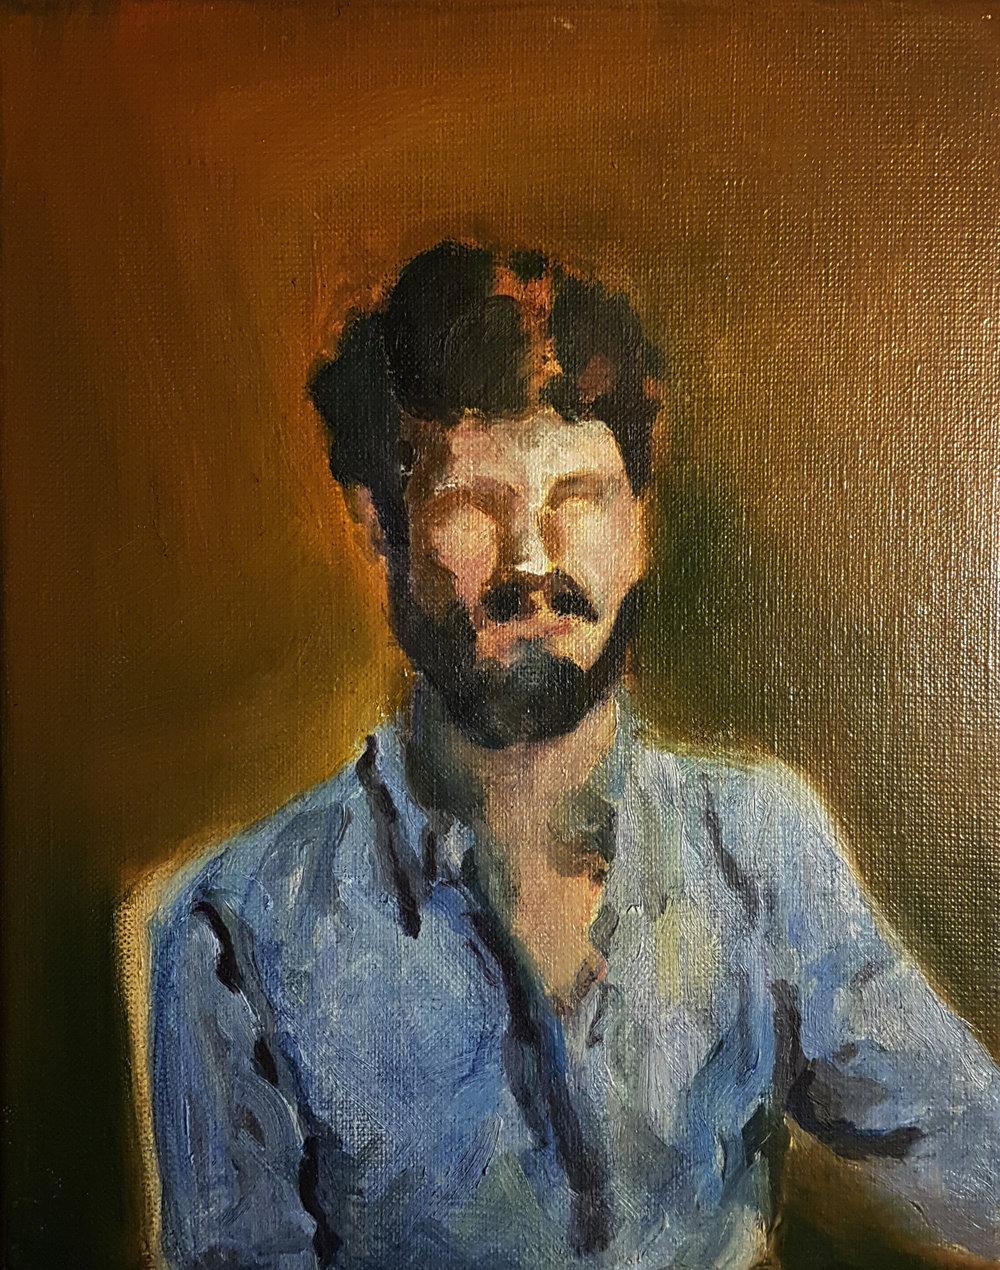 Self Portrait, 2016, oil on canvas